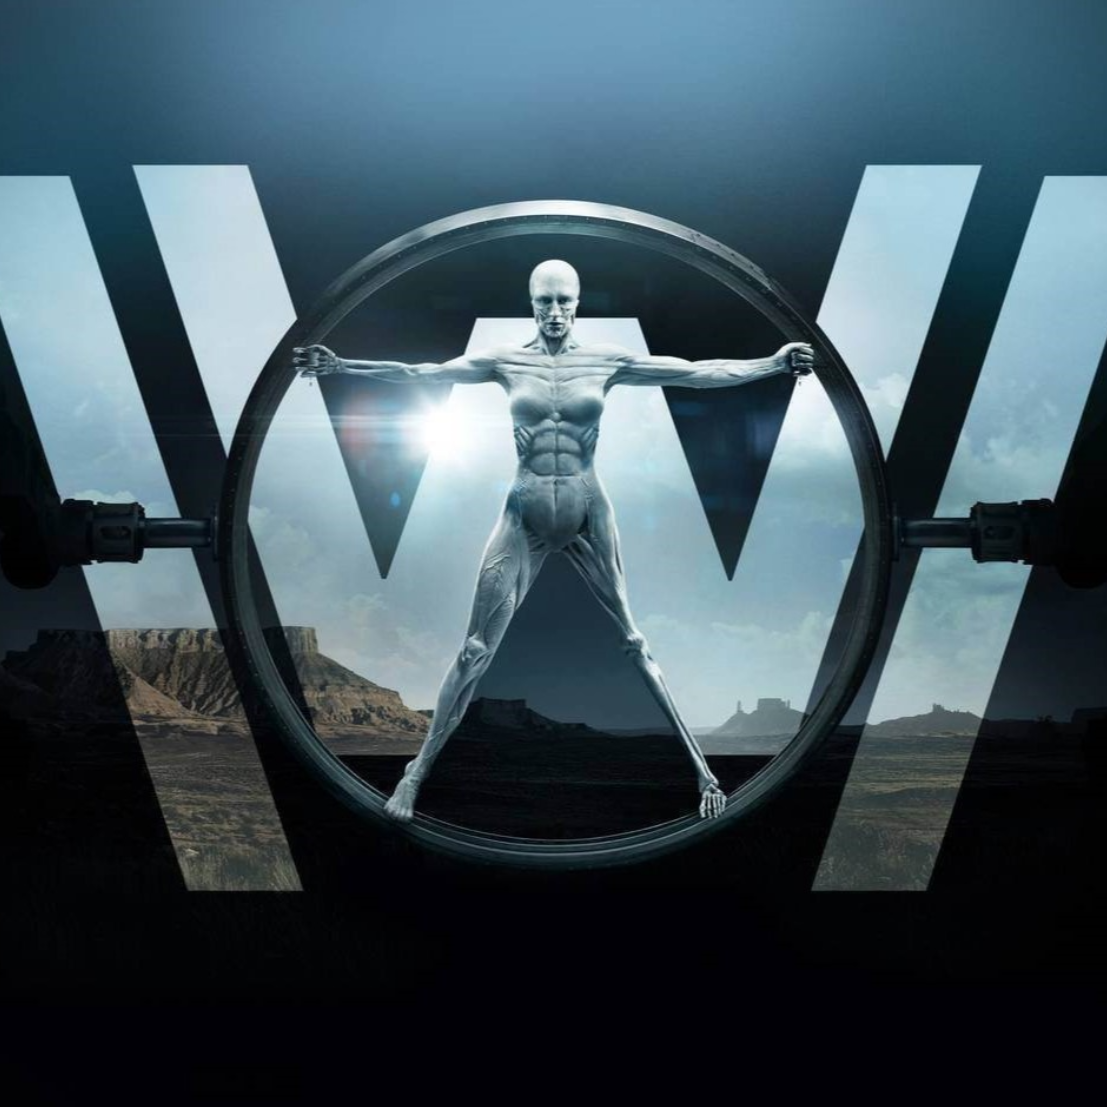 《西部世界》主题曲——Welcome to Westworld